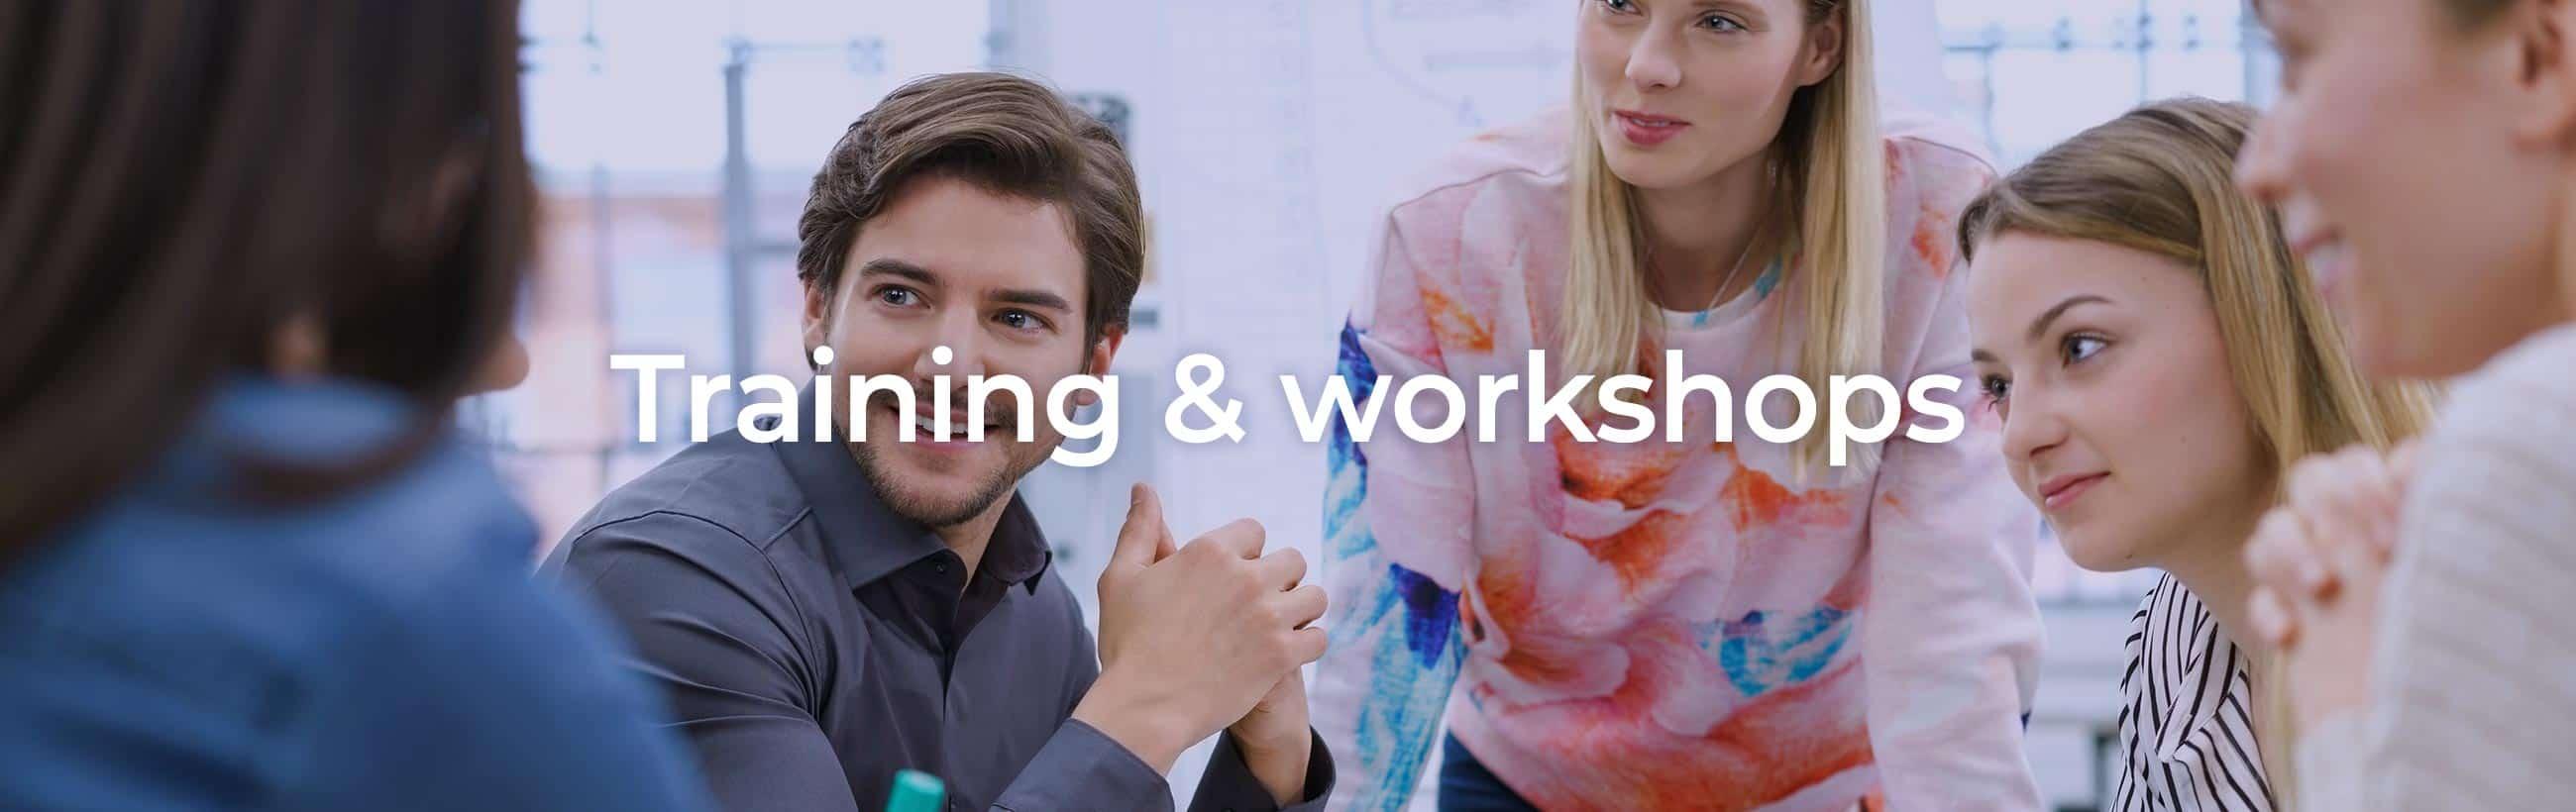 Training & workshops b2c - Blueberry Hill